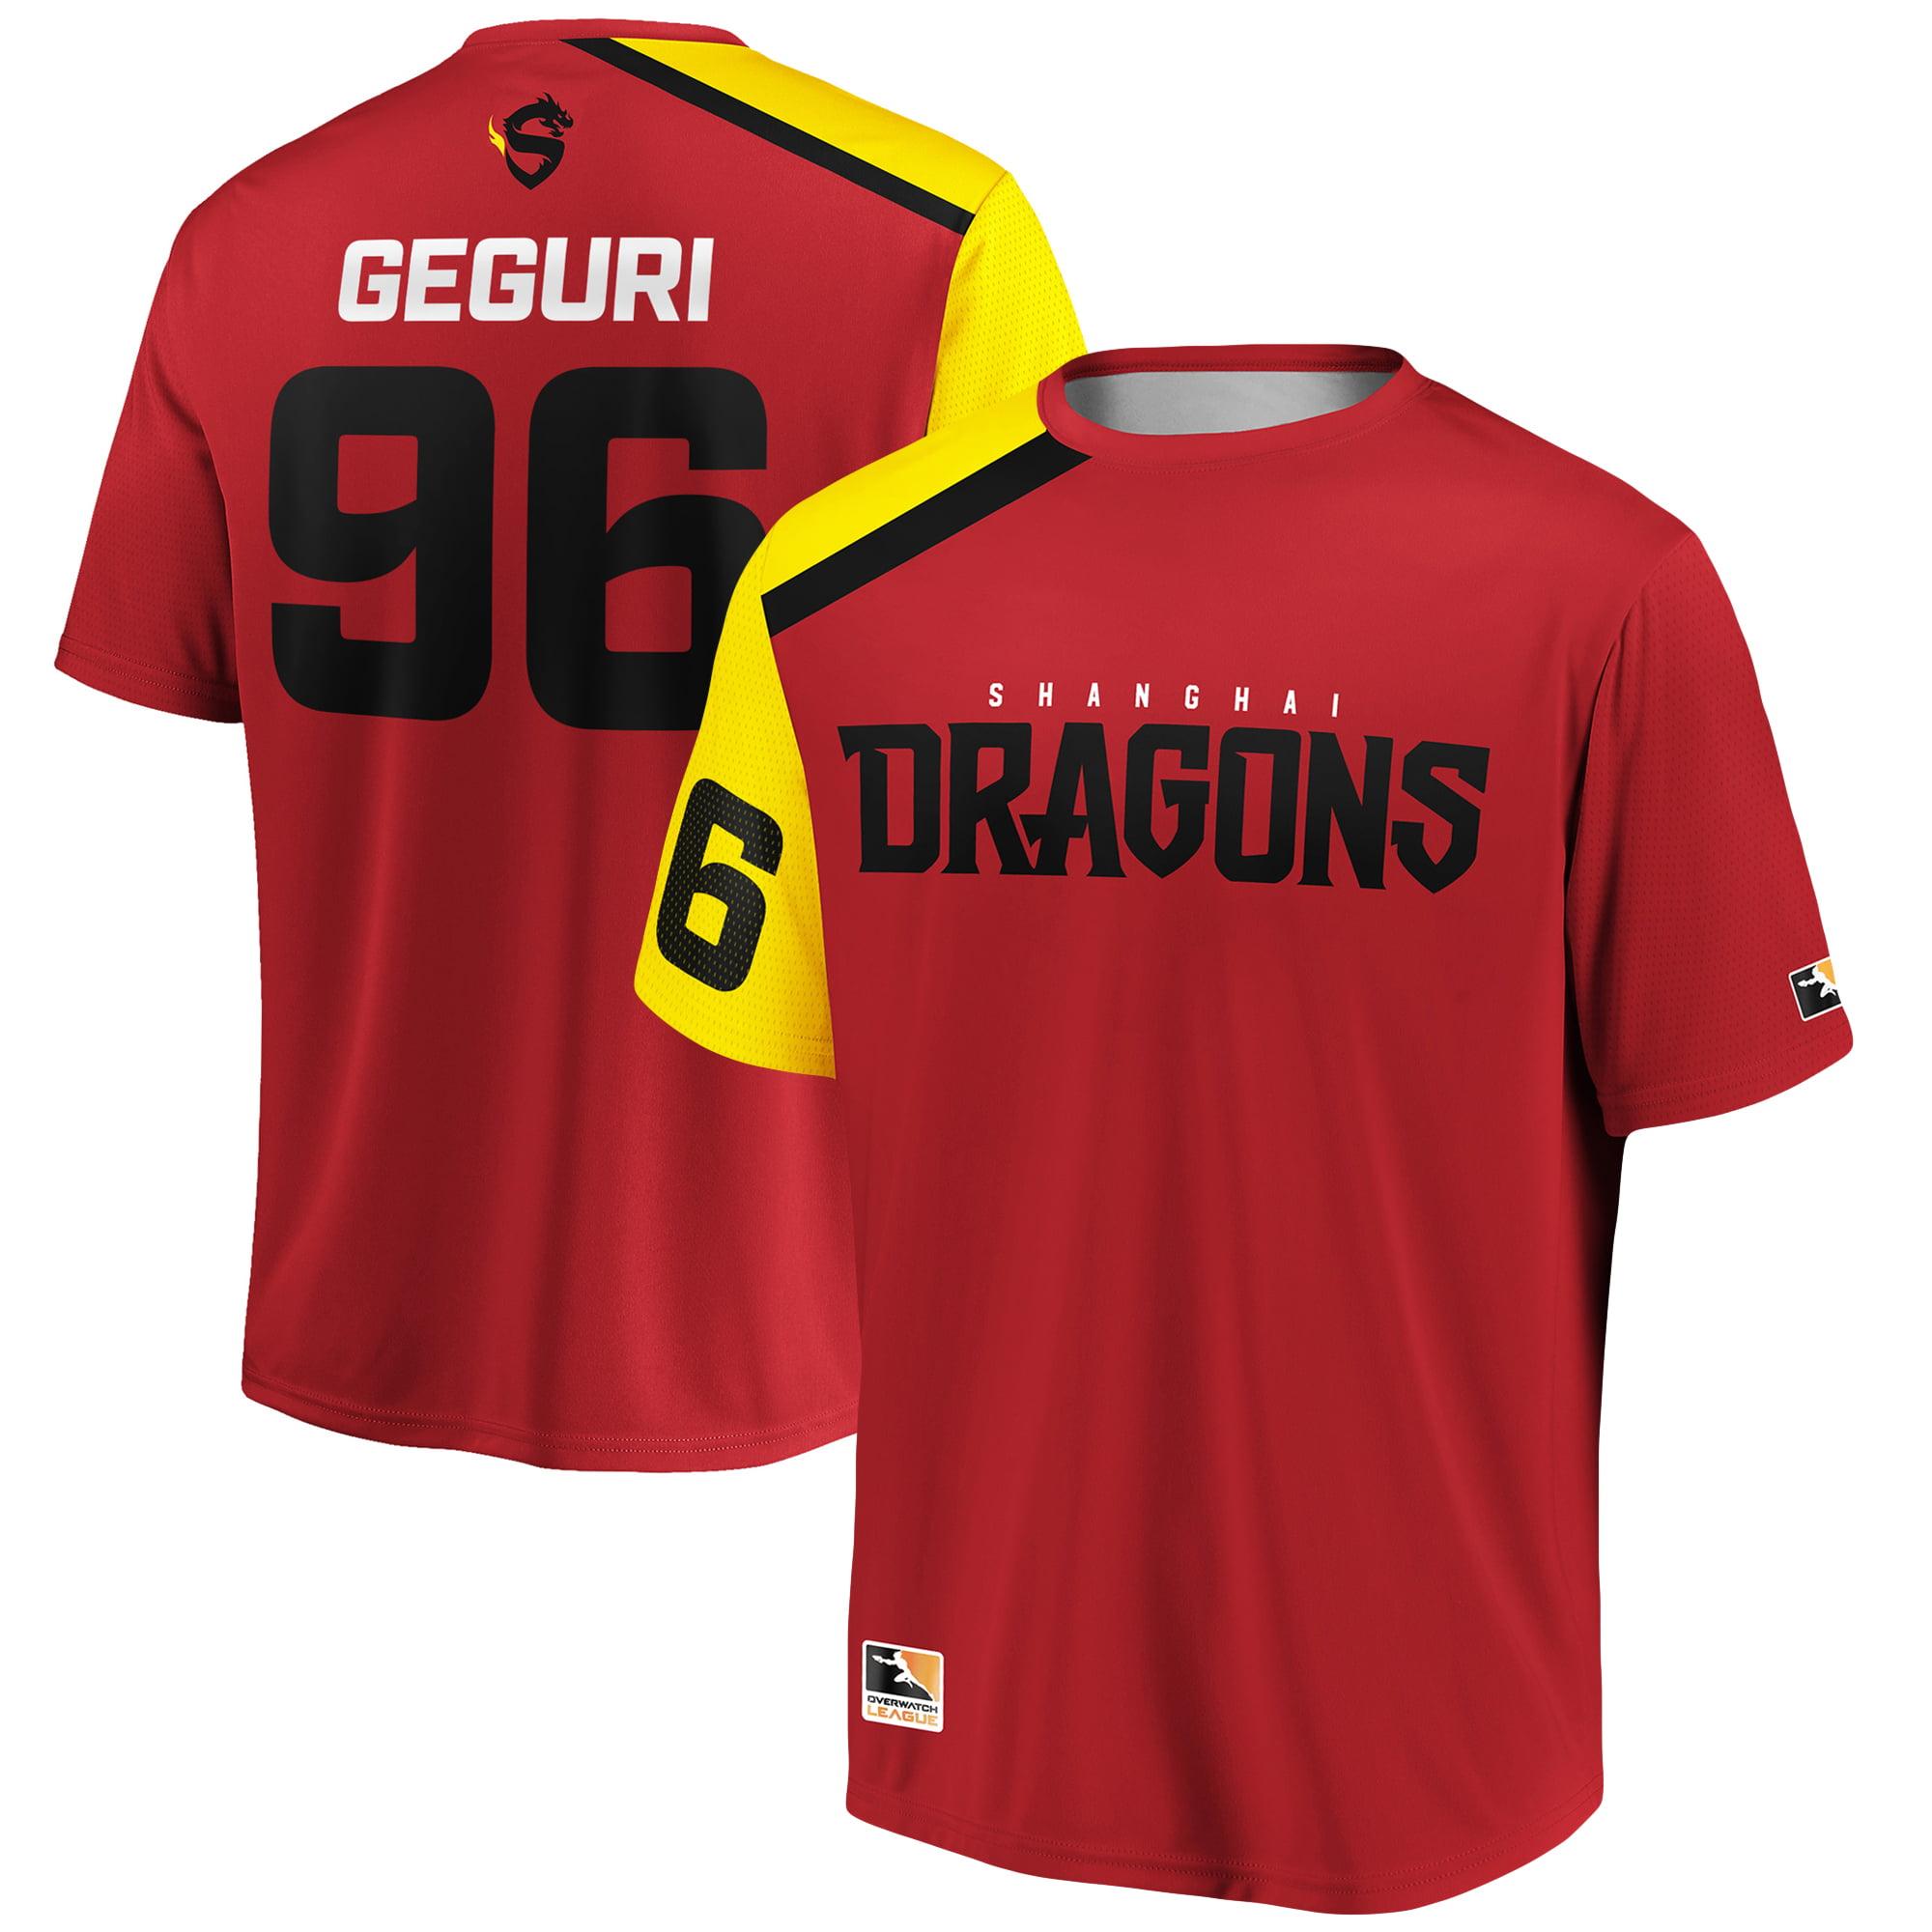 Geguri Shanghai Dragons Overwatch League Replica Home Jersey - Red